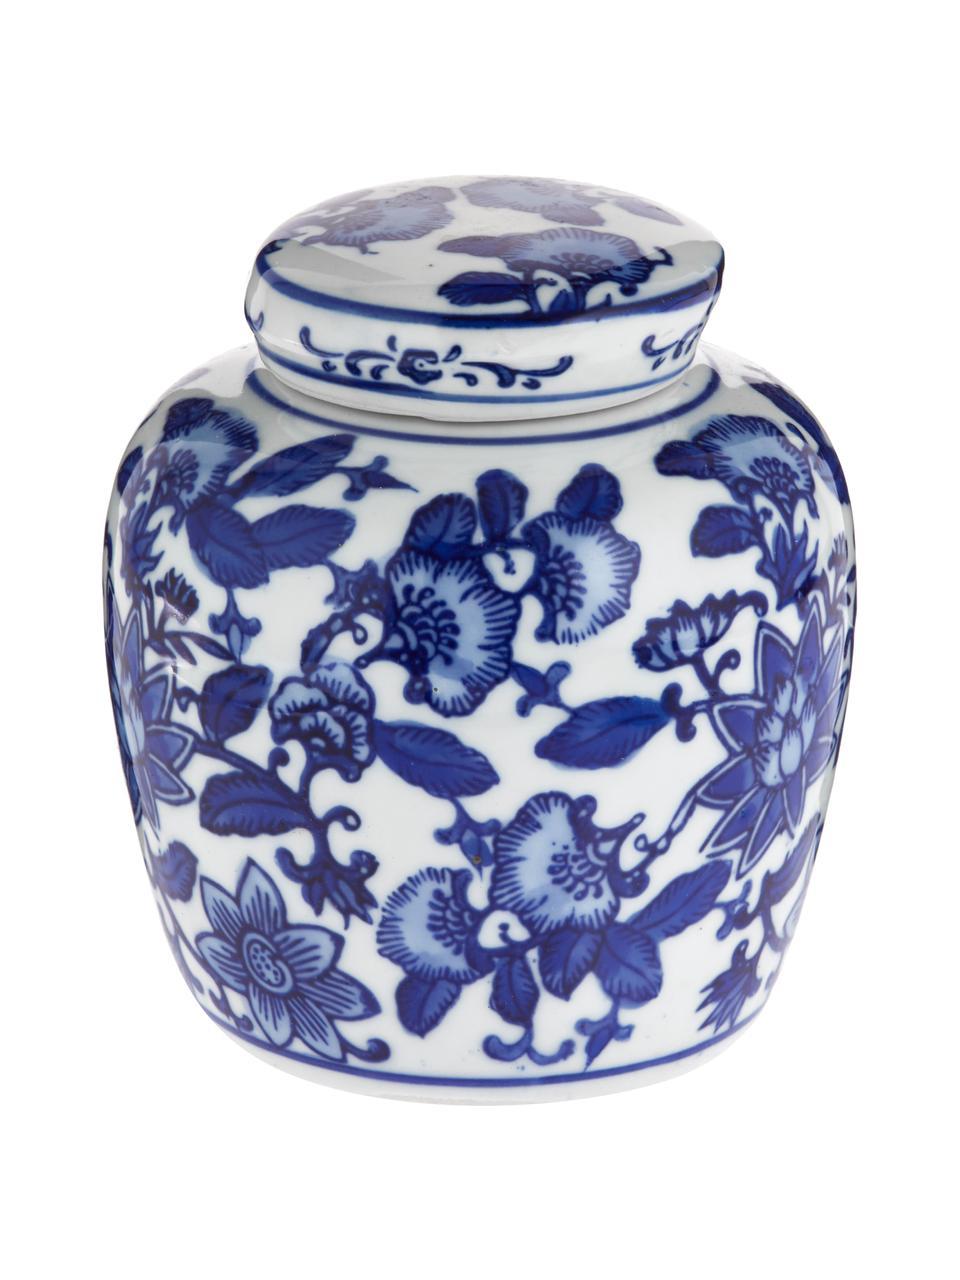 Vaso in porcellana con coperchio  Annabelle, Porcellana, Blu, bianco, Ø 11 x Alt. 13 cm